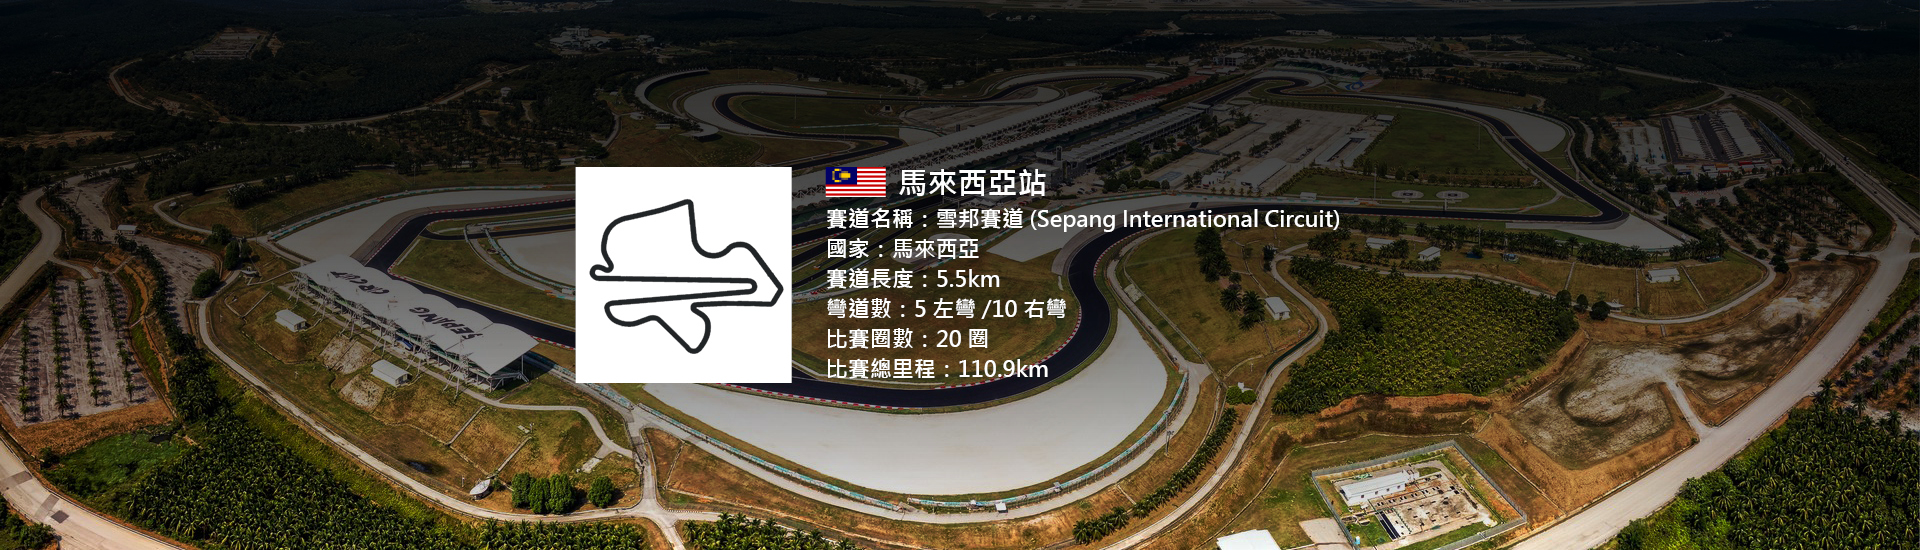 2018 MotoGP 馬來西亞站